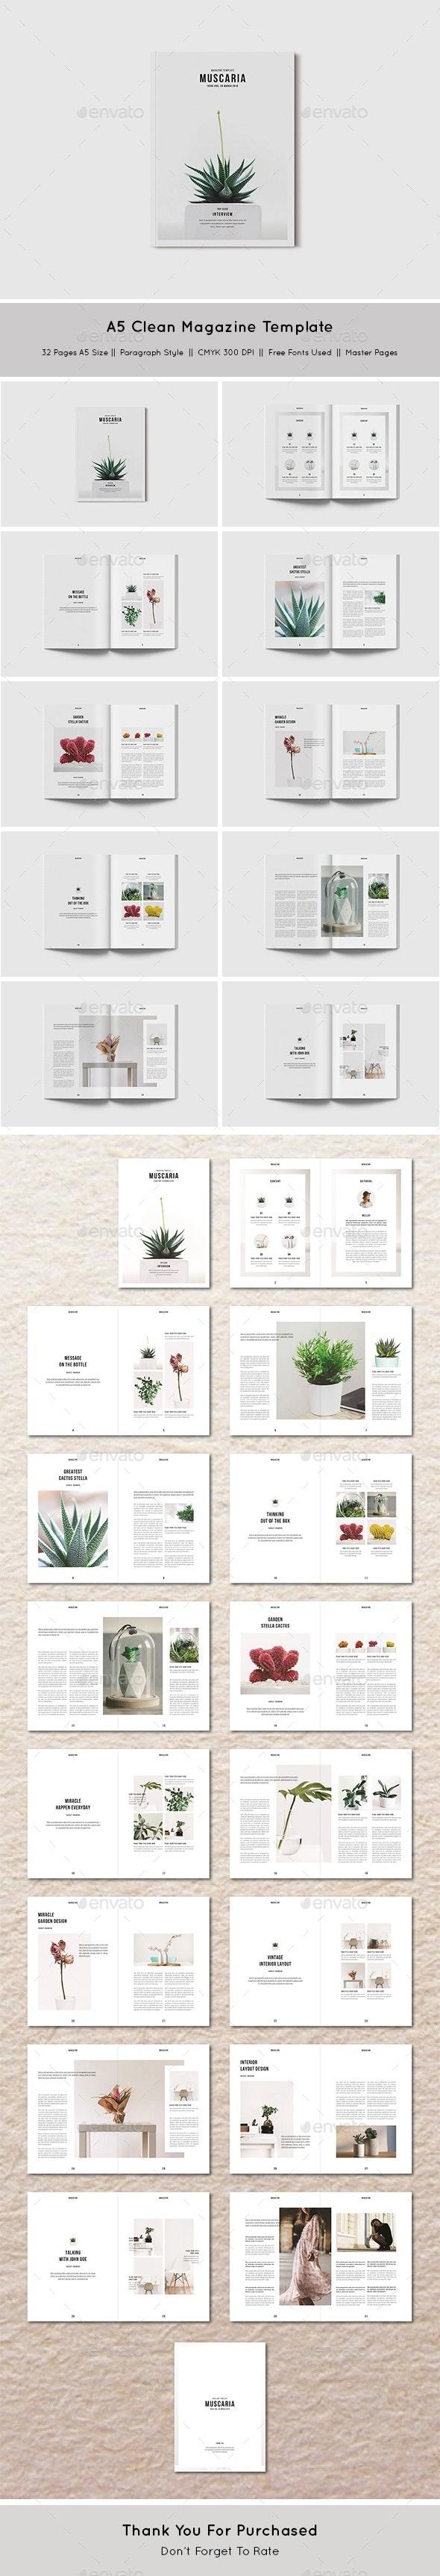 A5 Clean & Simple Magazine - Magazines Print Templates